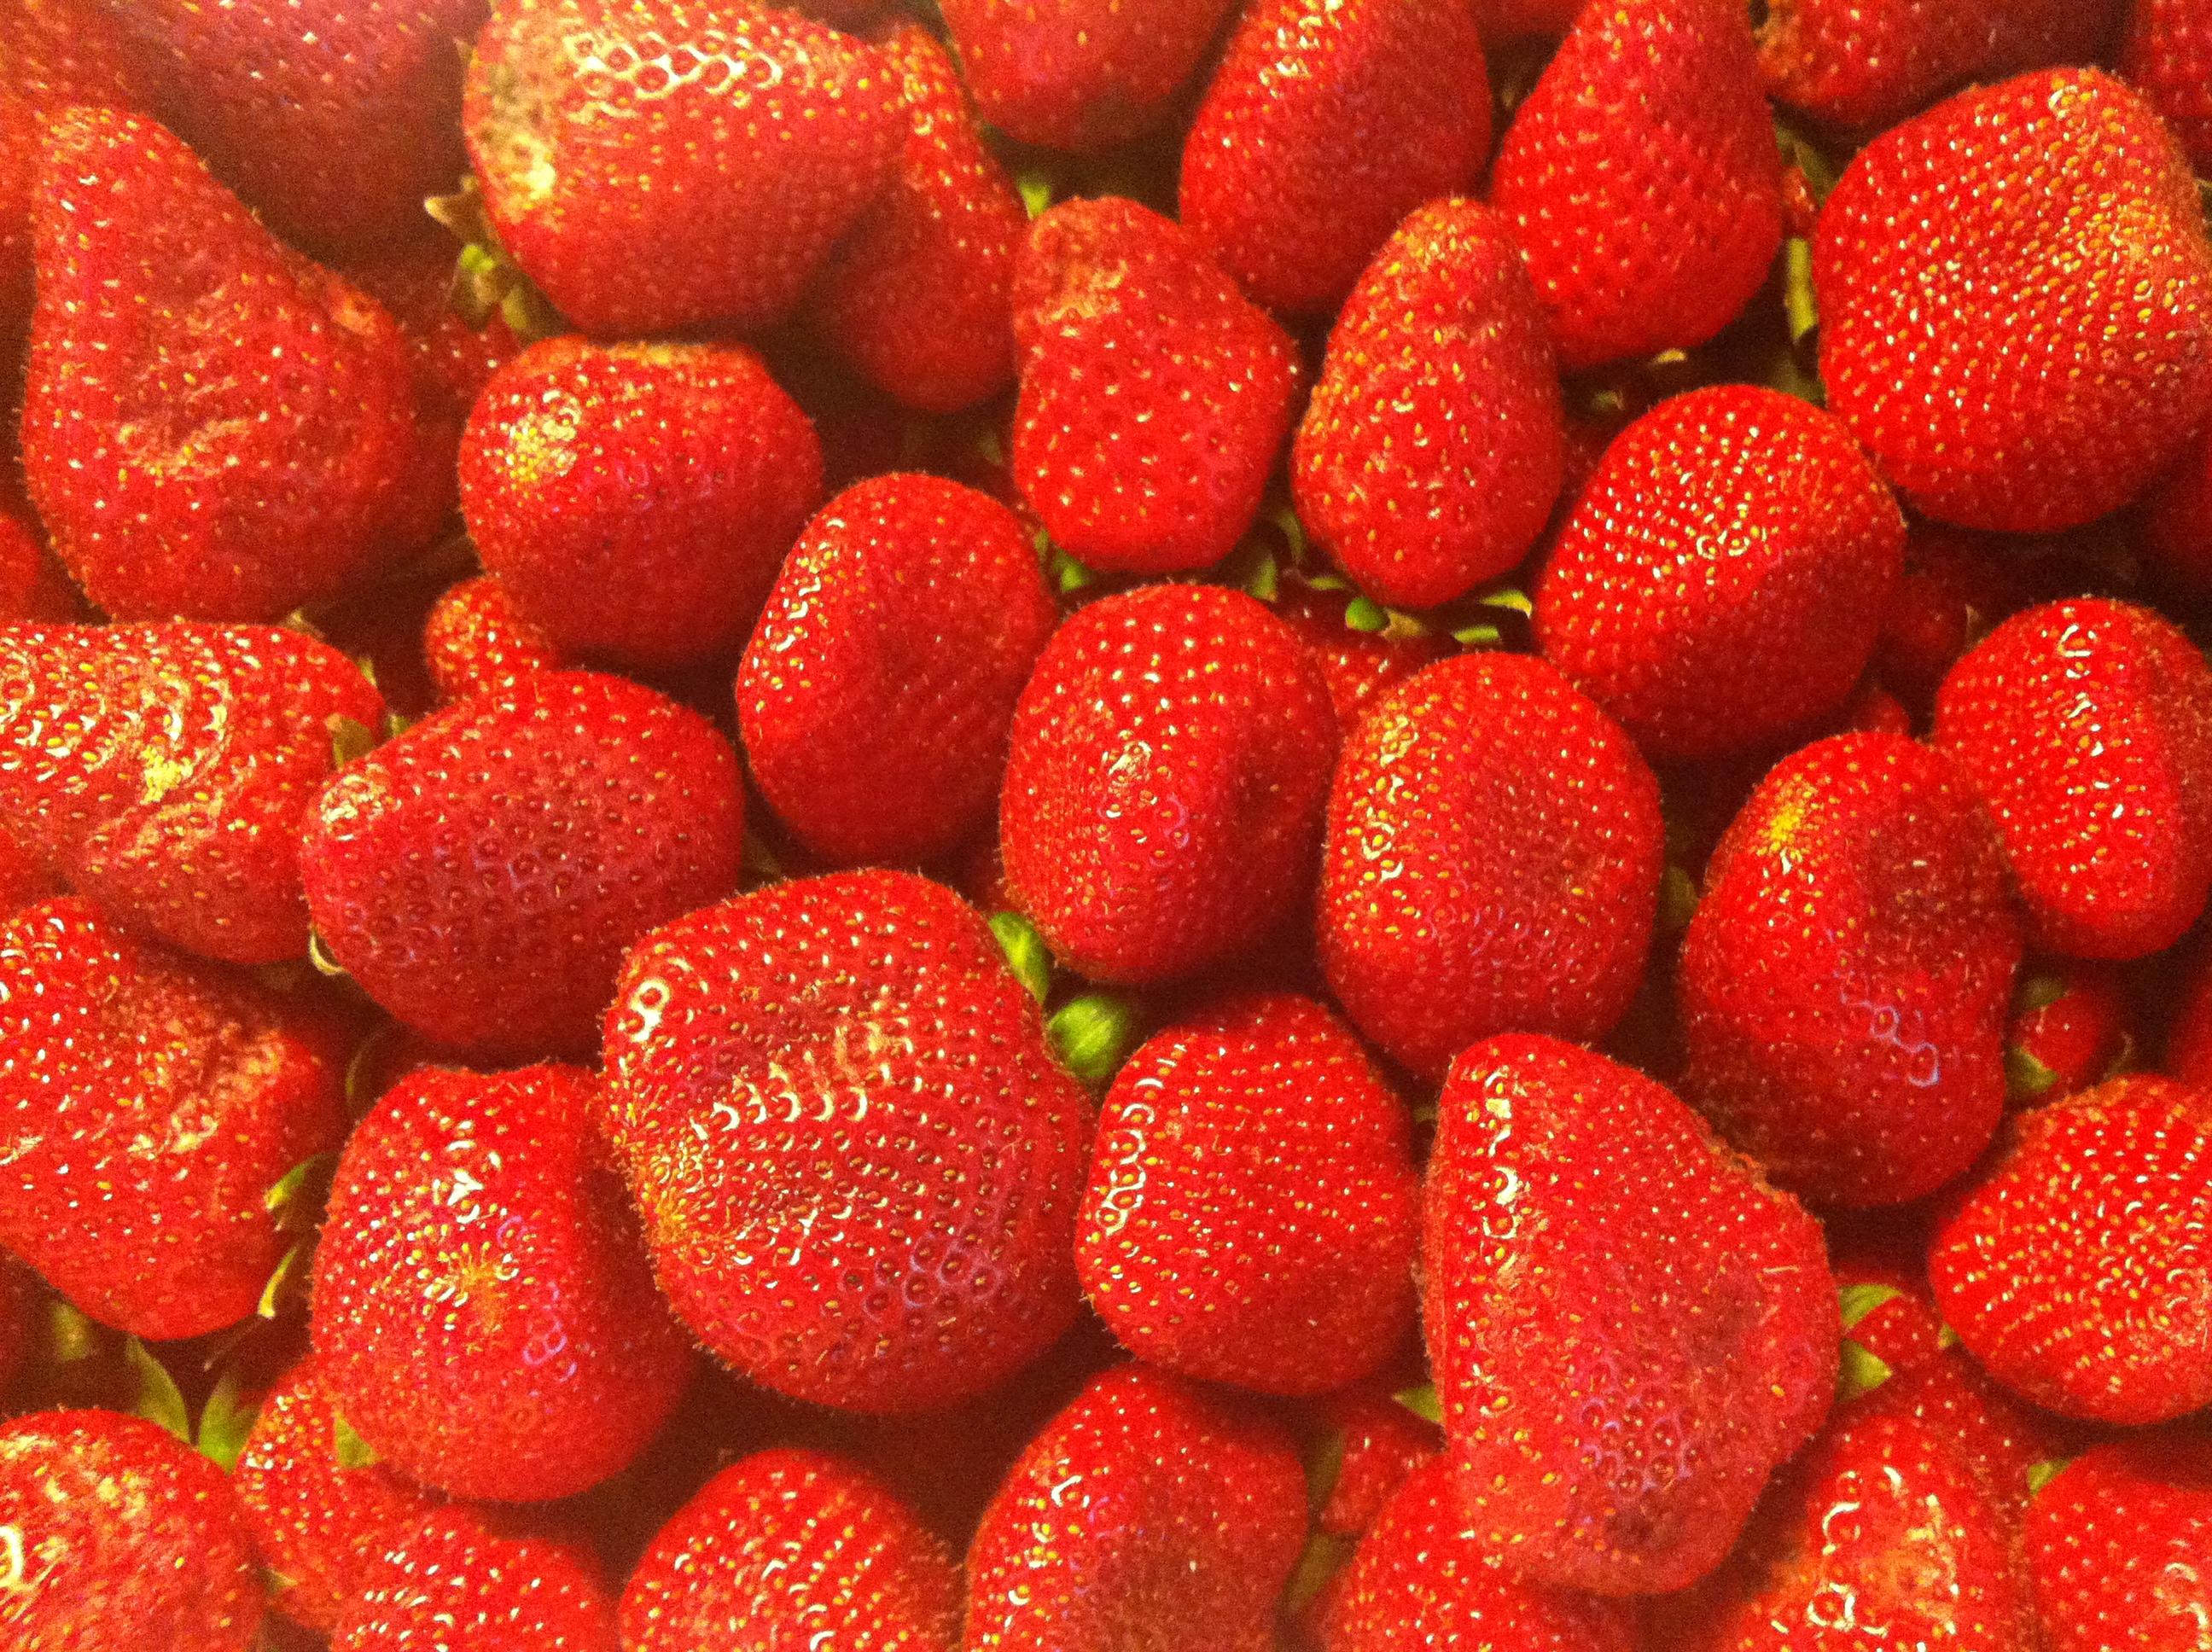 Jordbær dating site